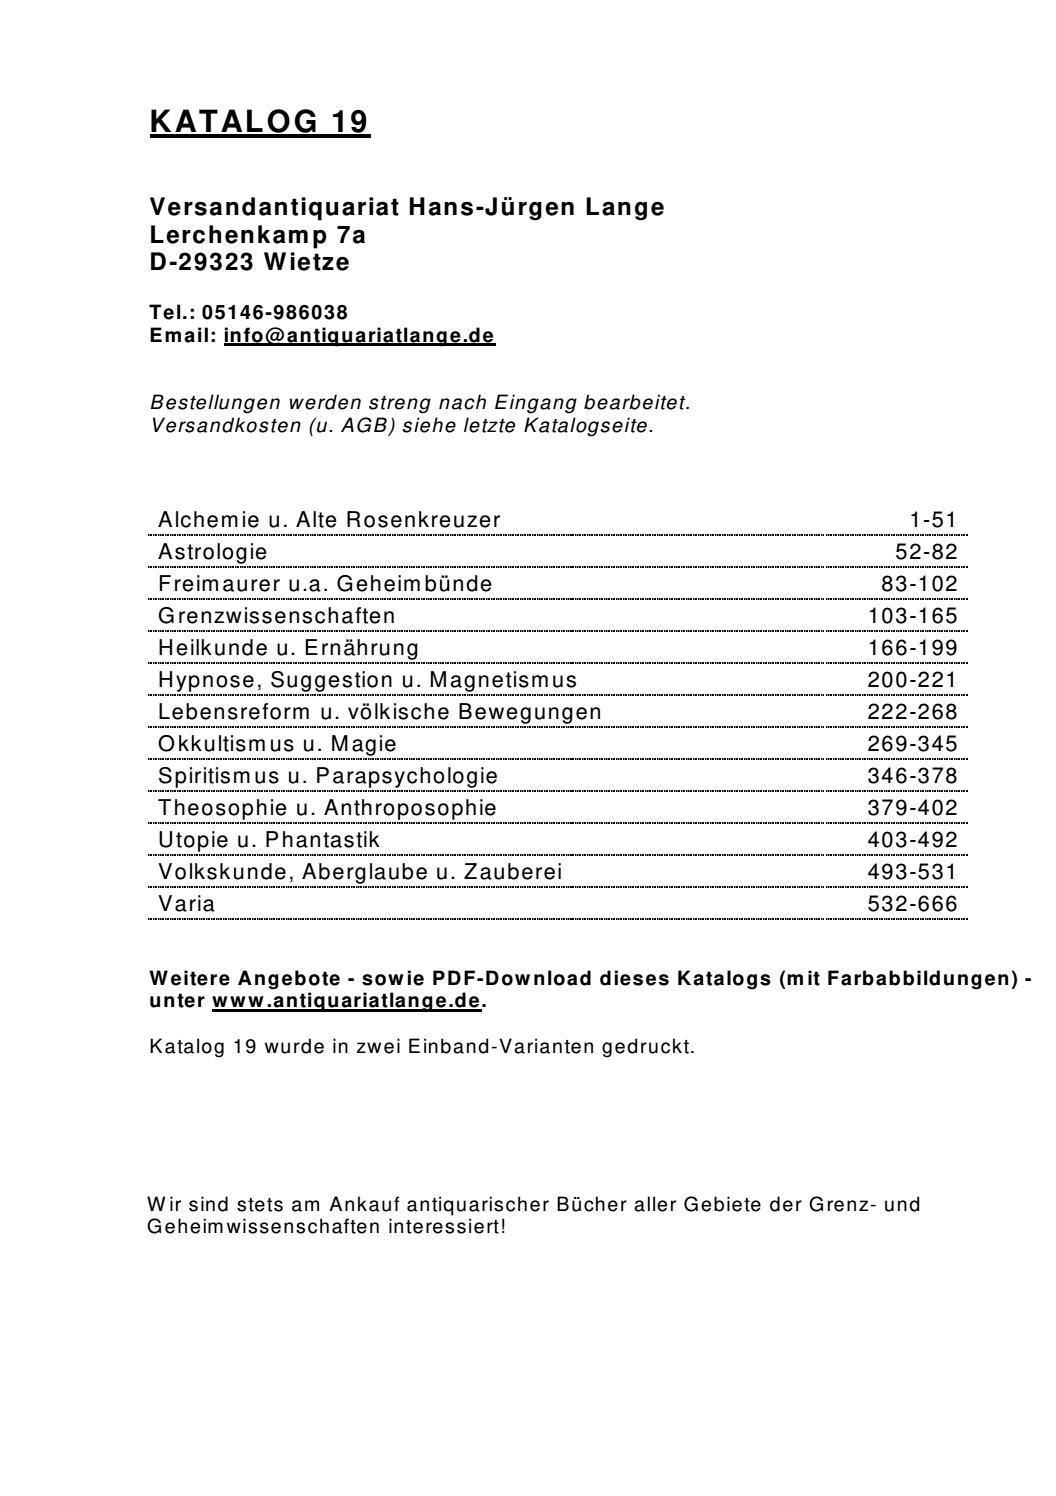 Versandantiquariat Hans-Jürgen Lange - Katalog19 by Versandantiquariat  Hans-Jürgen Lange - issuu